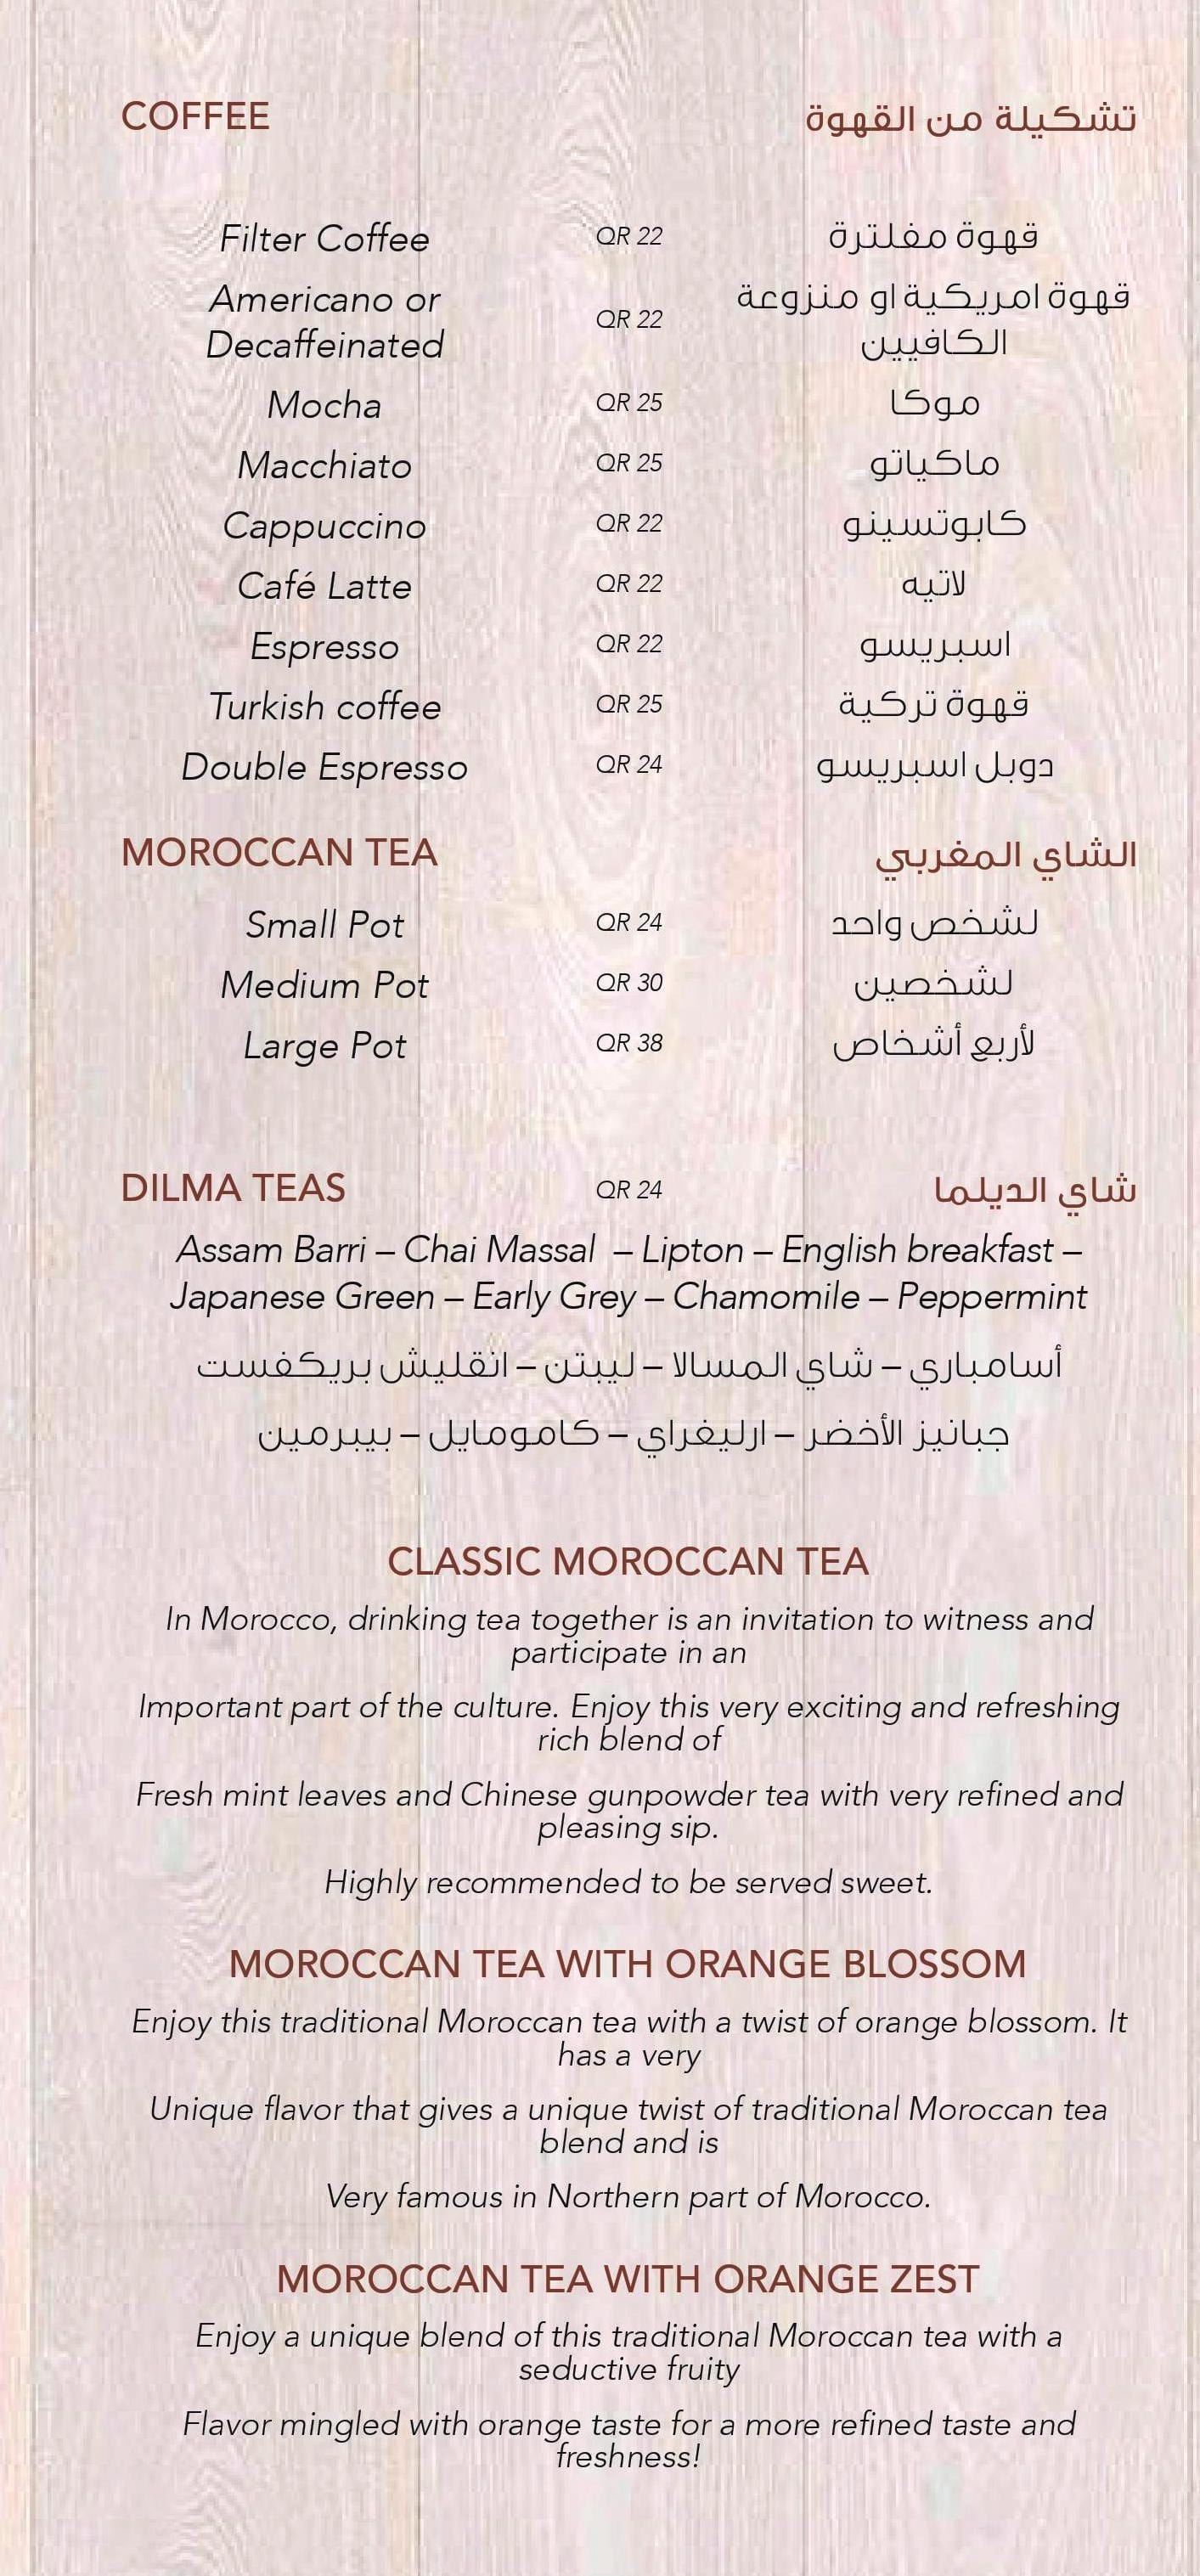 The Drawing Room - Souq Waqif Boutique Hotel Al Jasra Menu